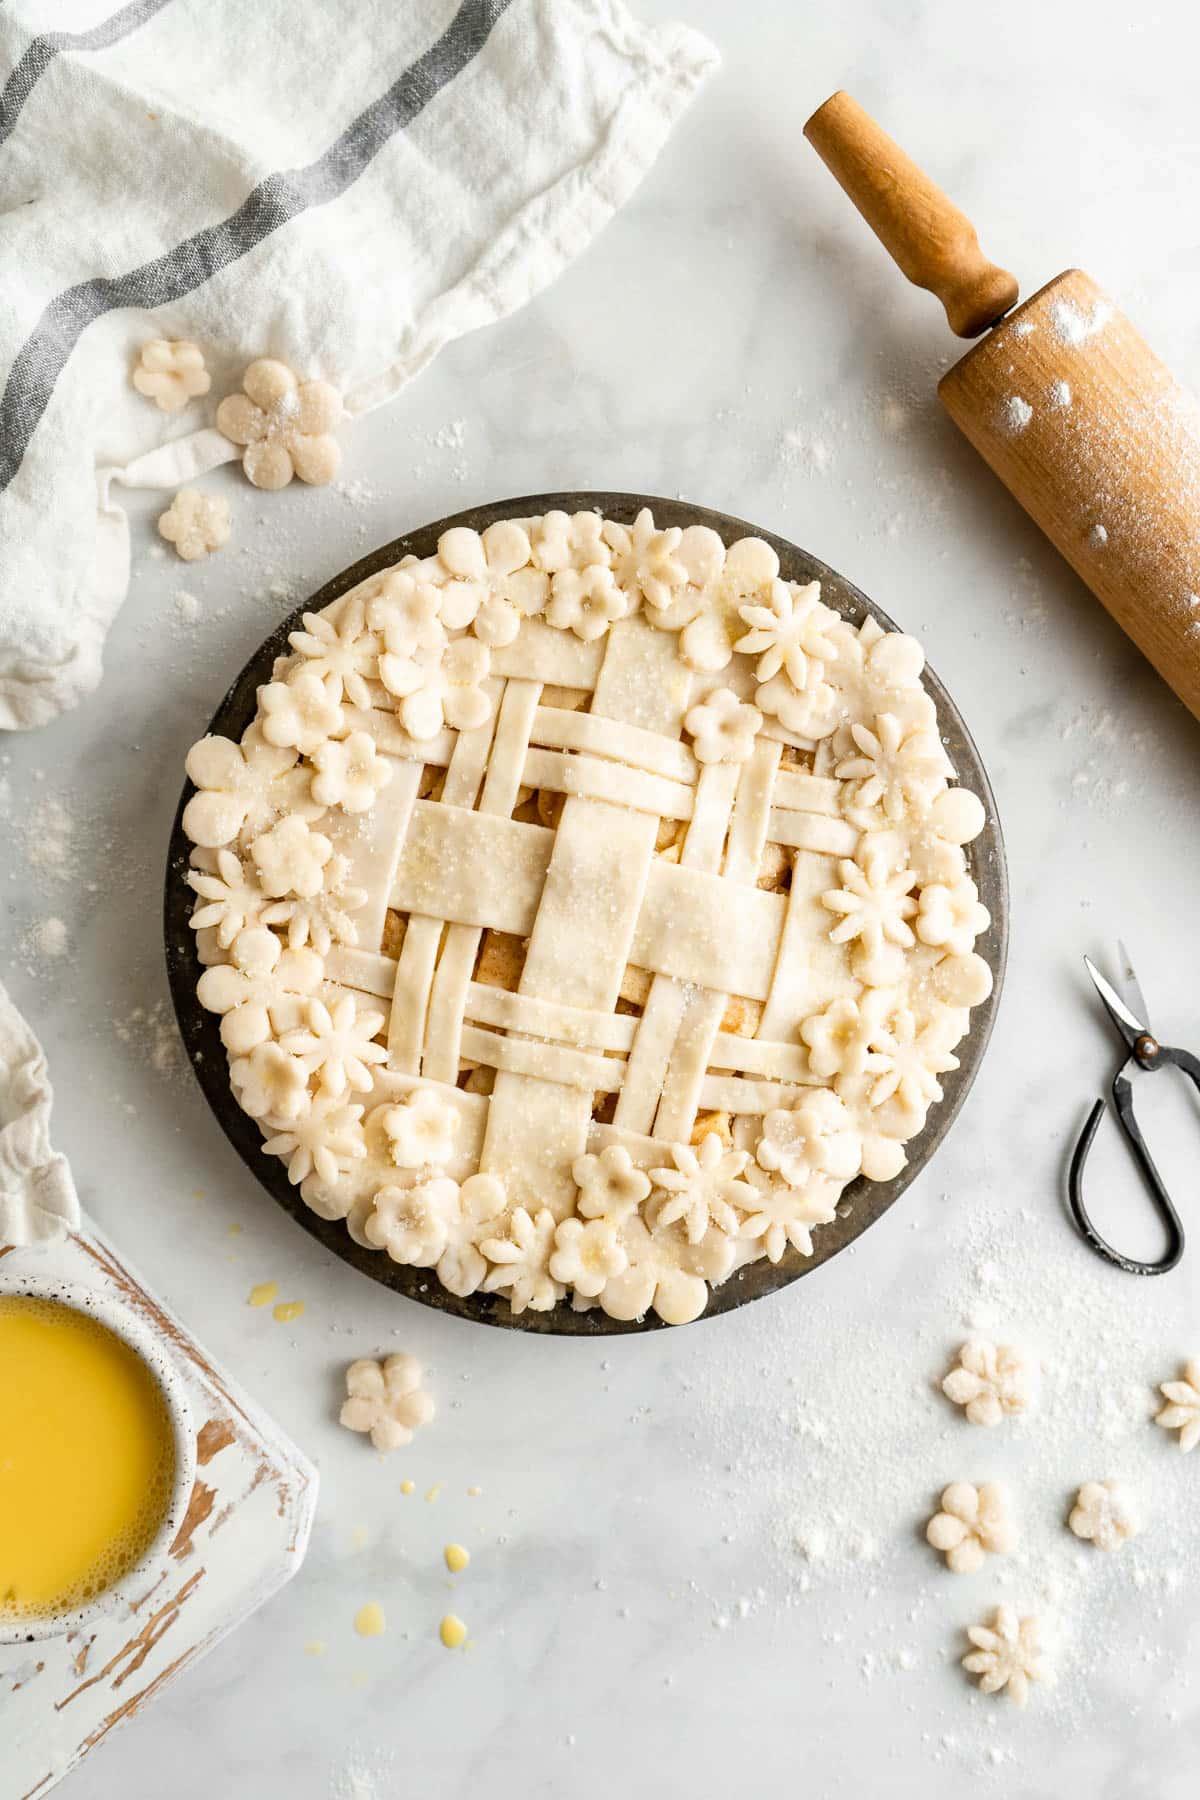 adding top crust of homemade apple pie